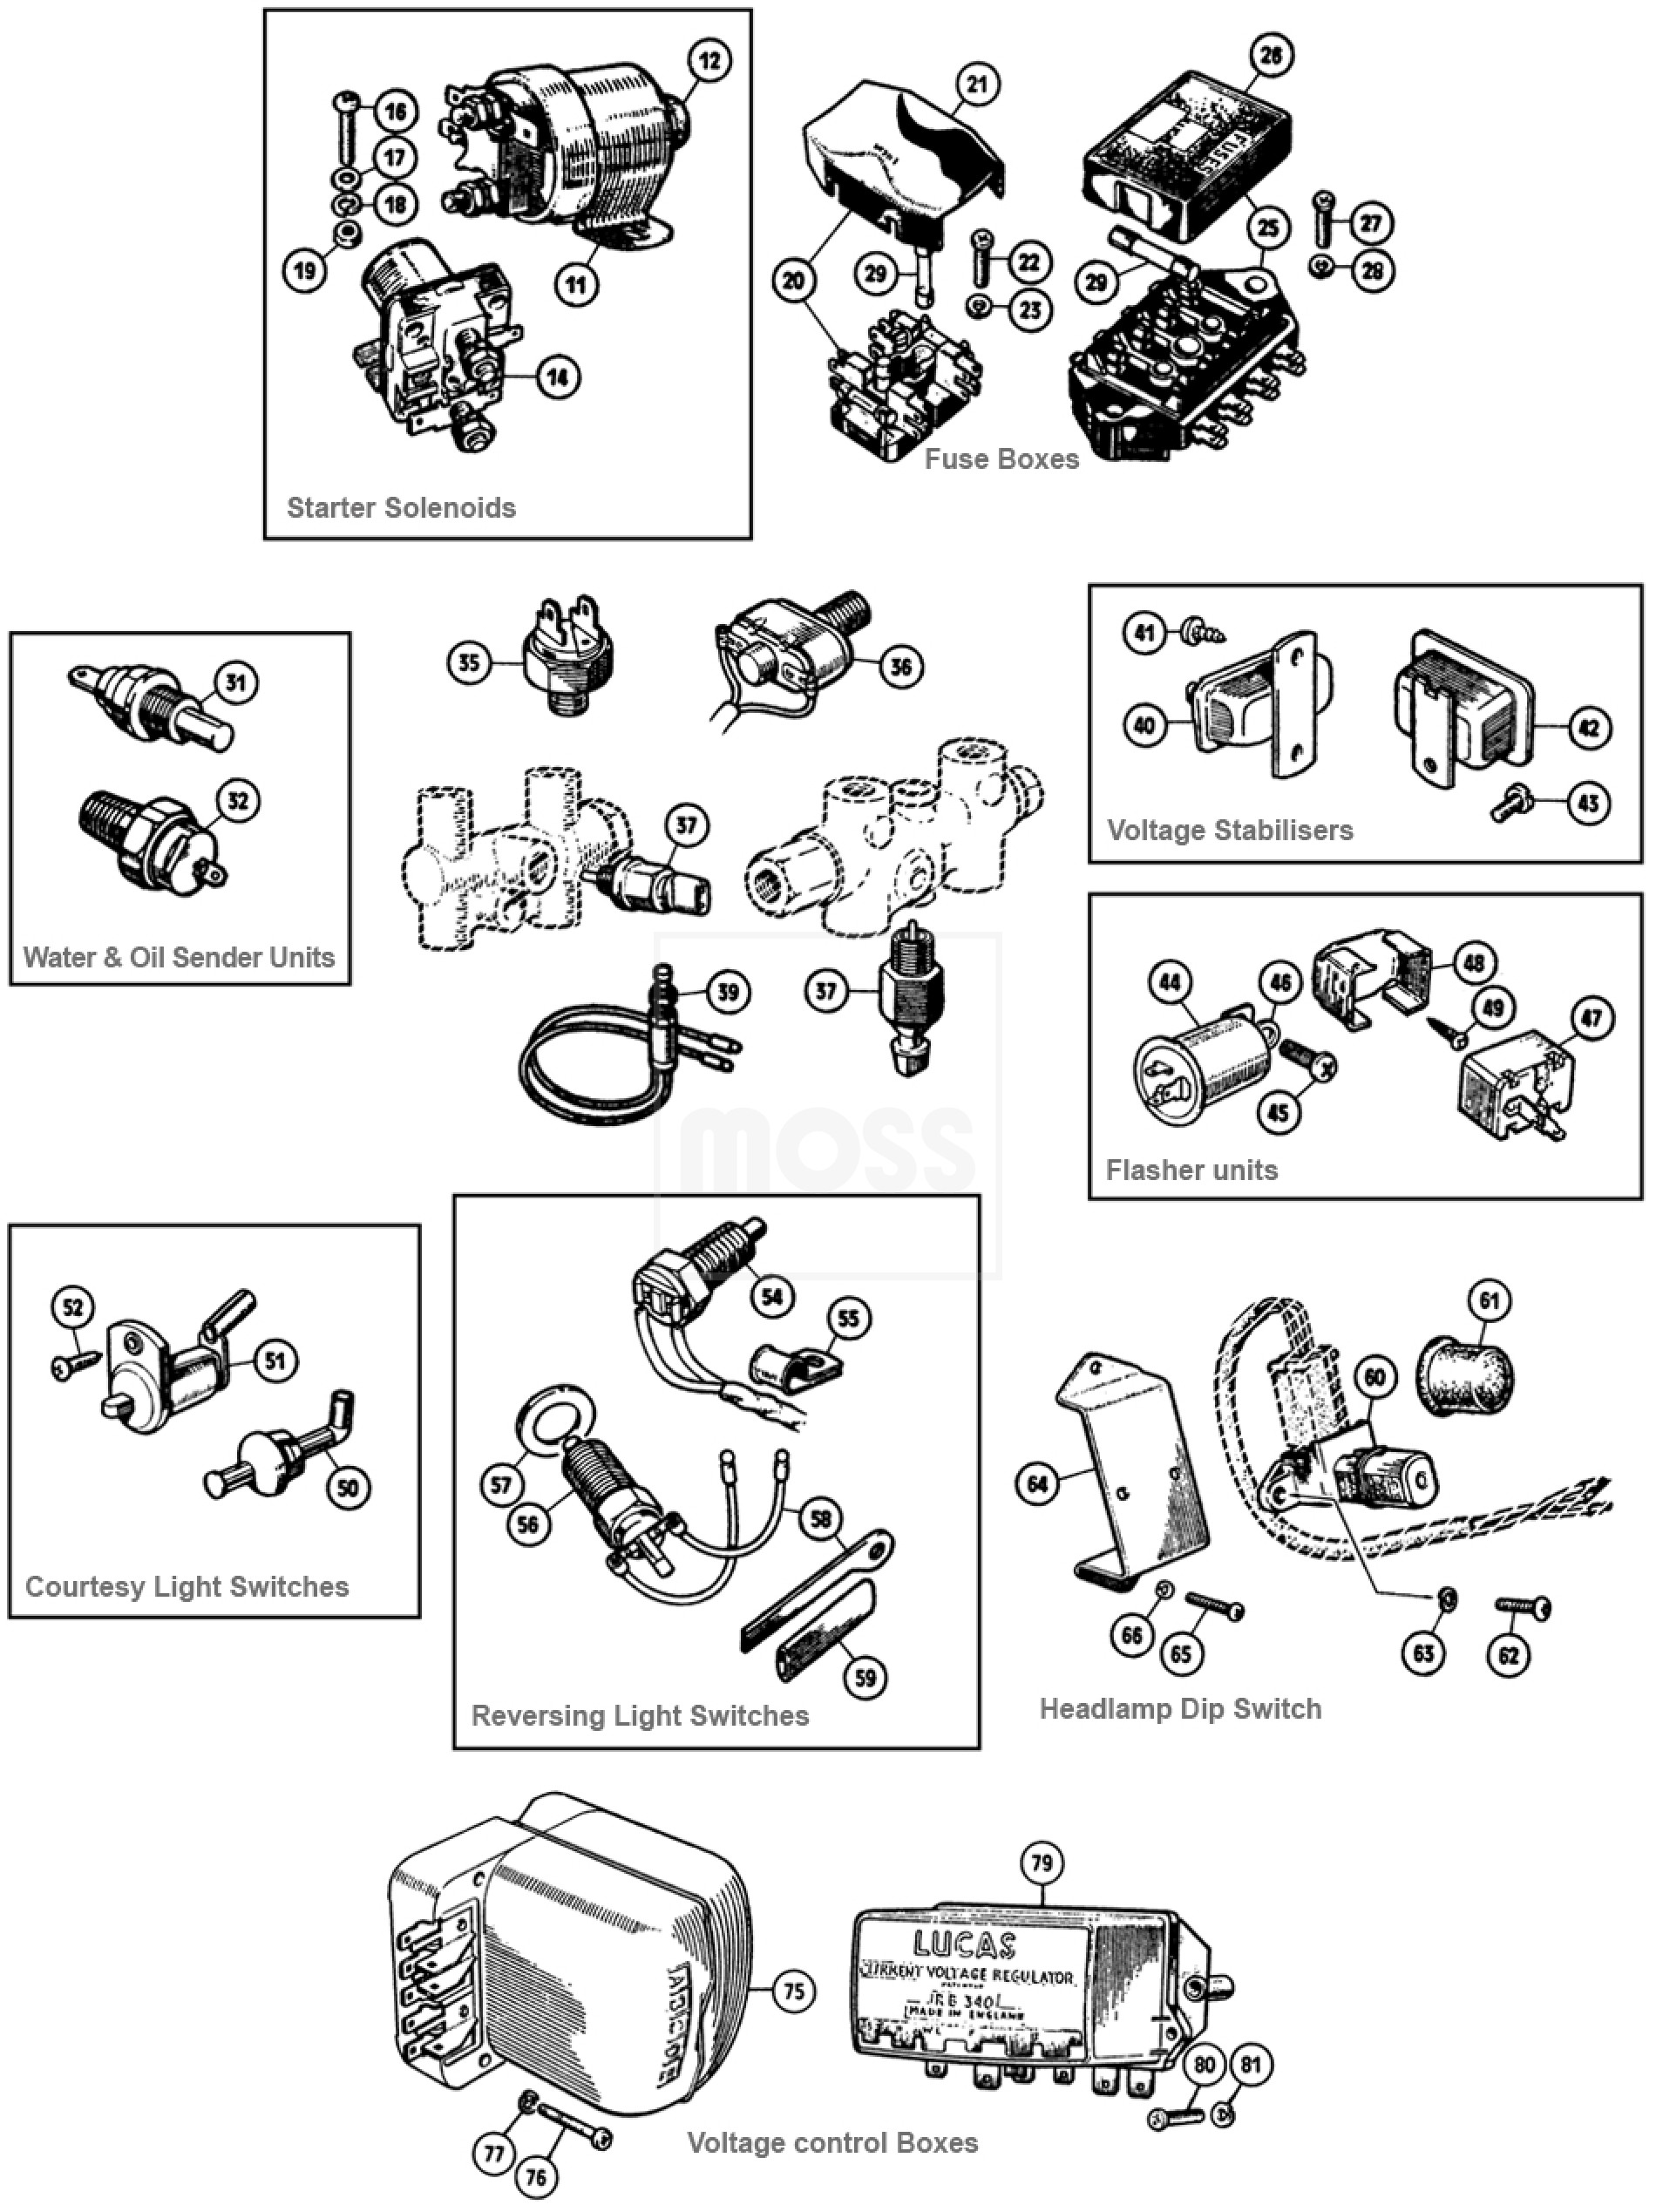 Switches & Controls: Sprite IV & Midget III, 1500cc